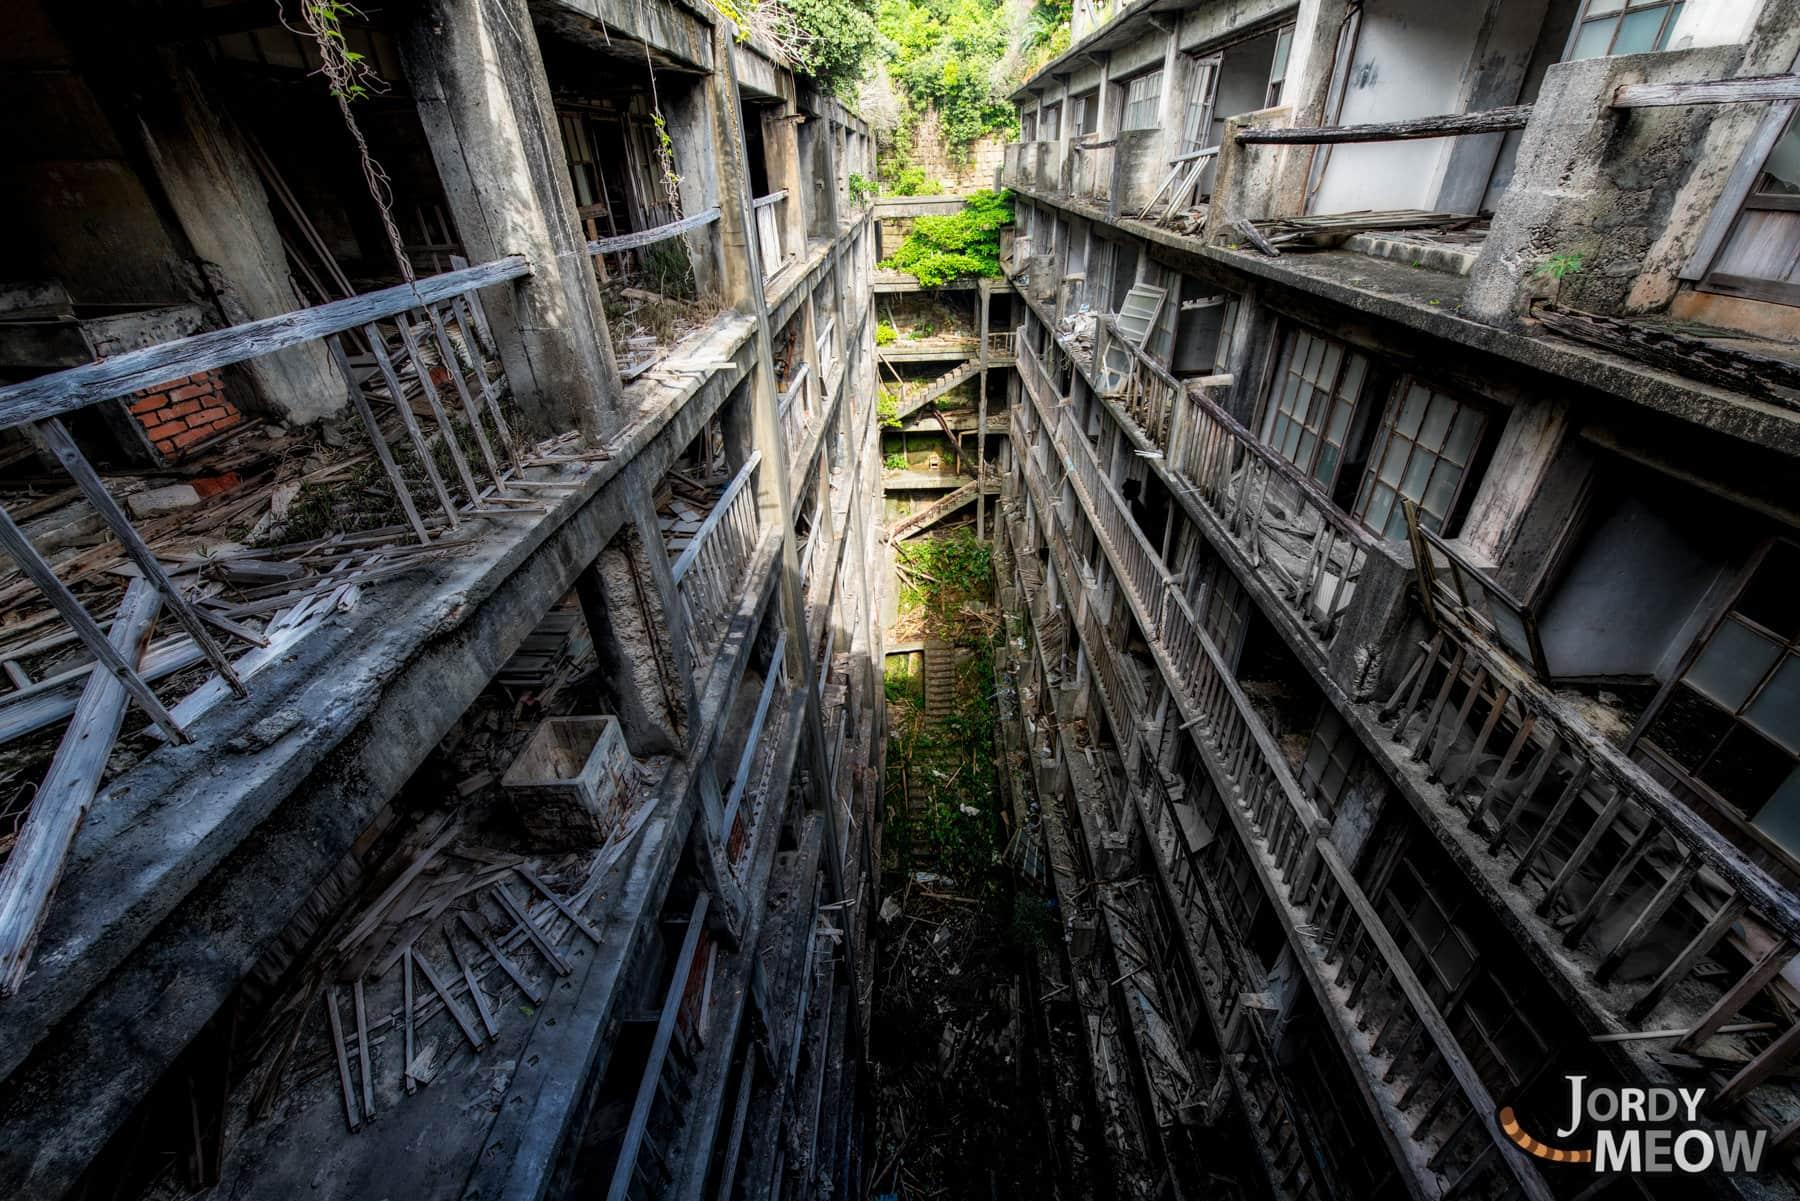 abandoned, by-dreamy, gunkanjima, haikyo, japan, japanese, kyushu, nagasaki, on-sale, ruin, urban exploration, urbex